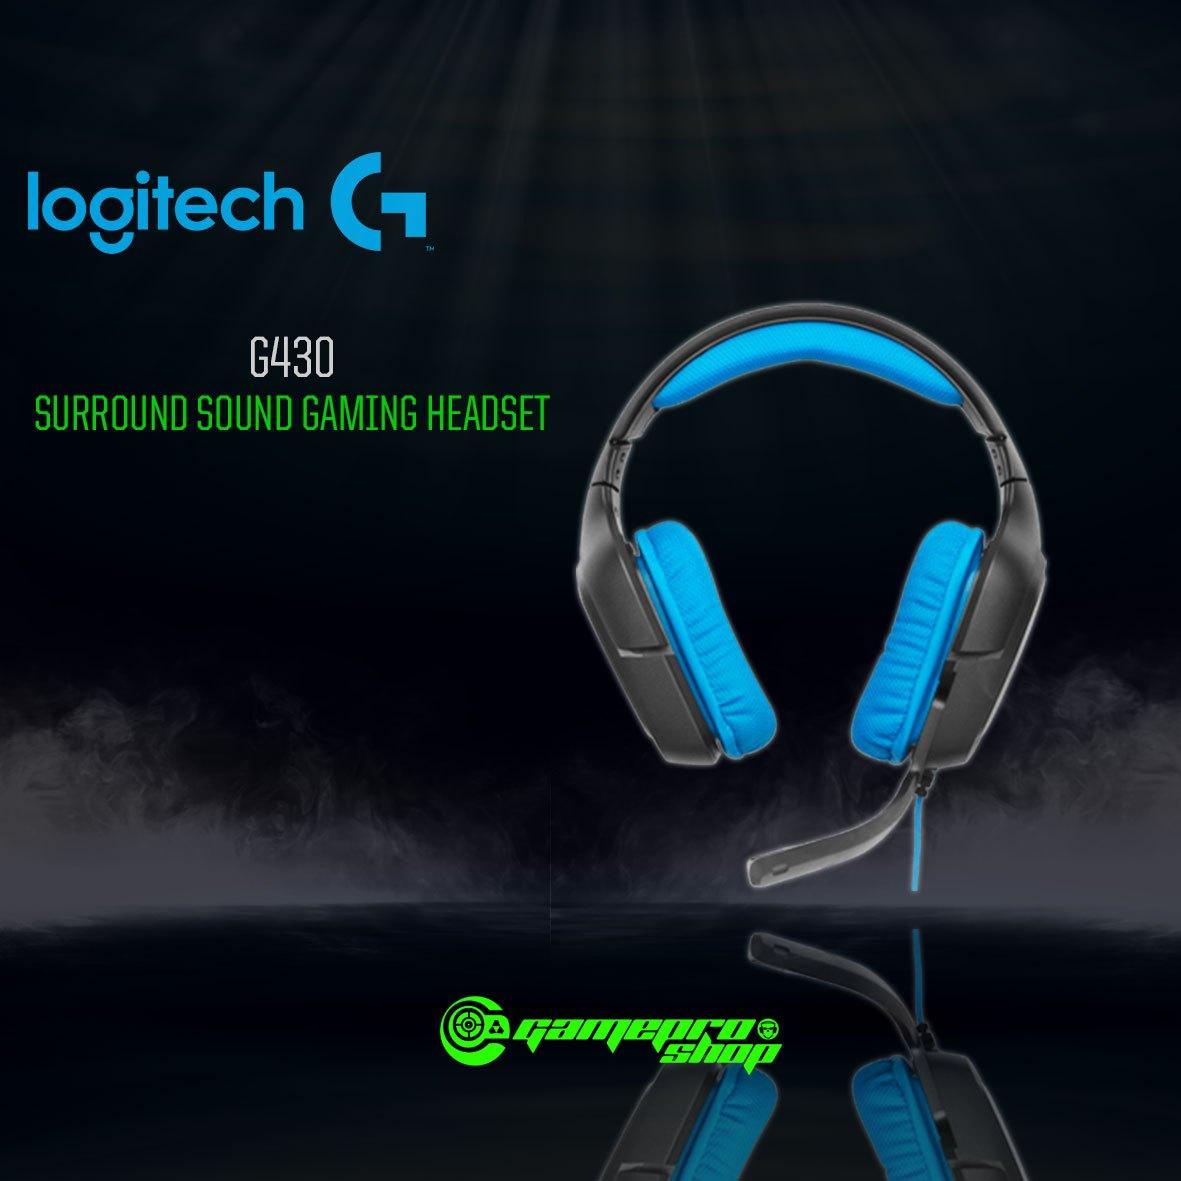 a96f75077ba Logitech G430 (981-000538) Digital Gaming Headset - GamePro Shop